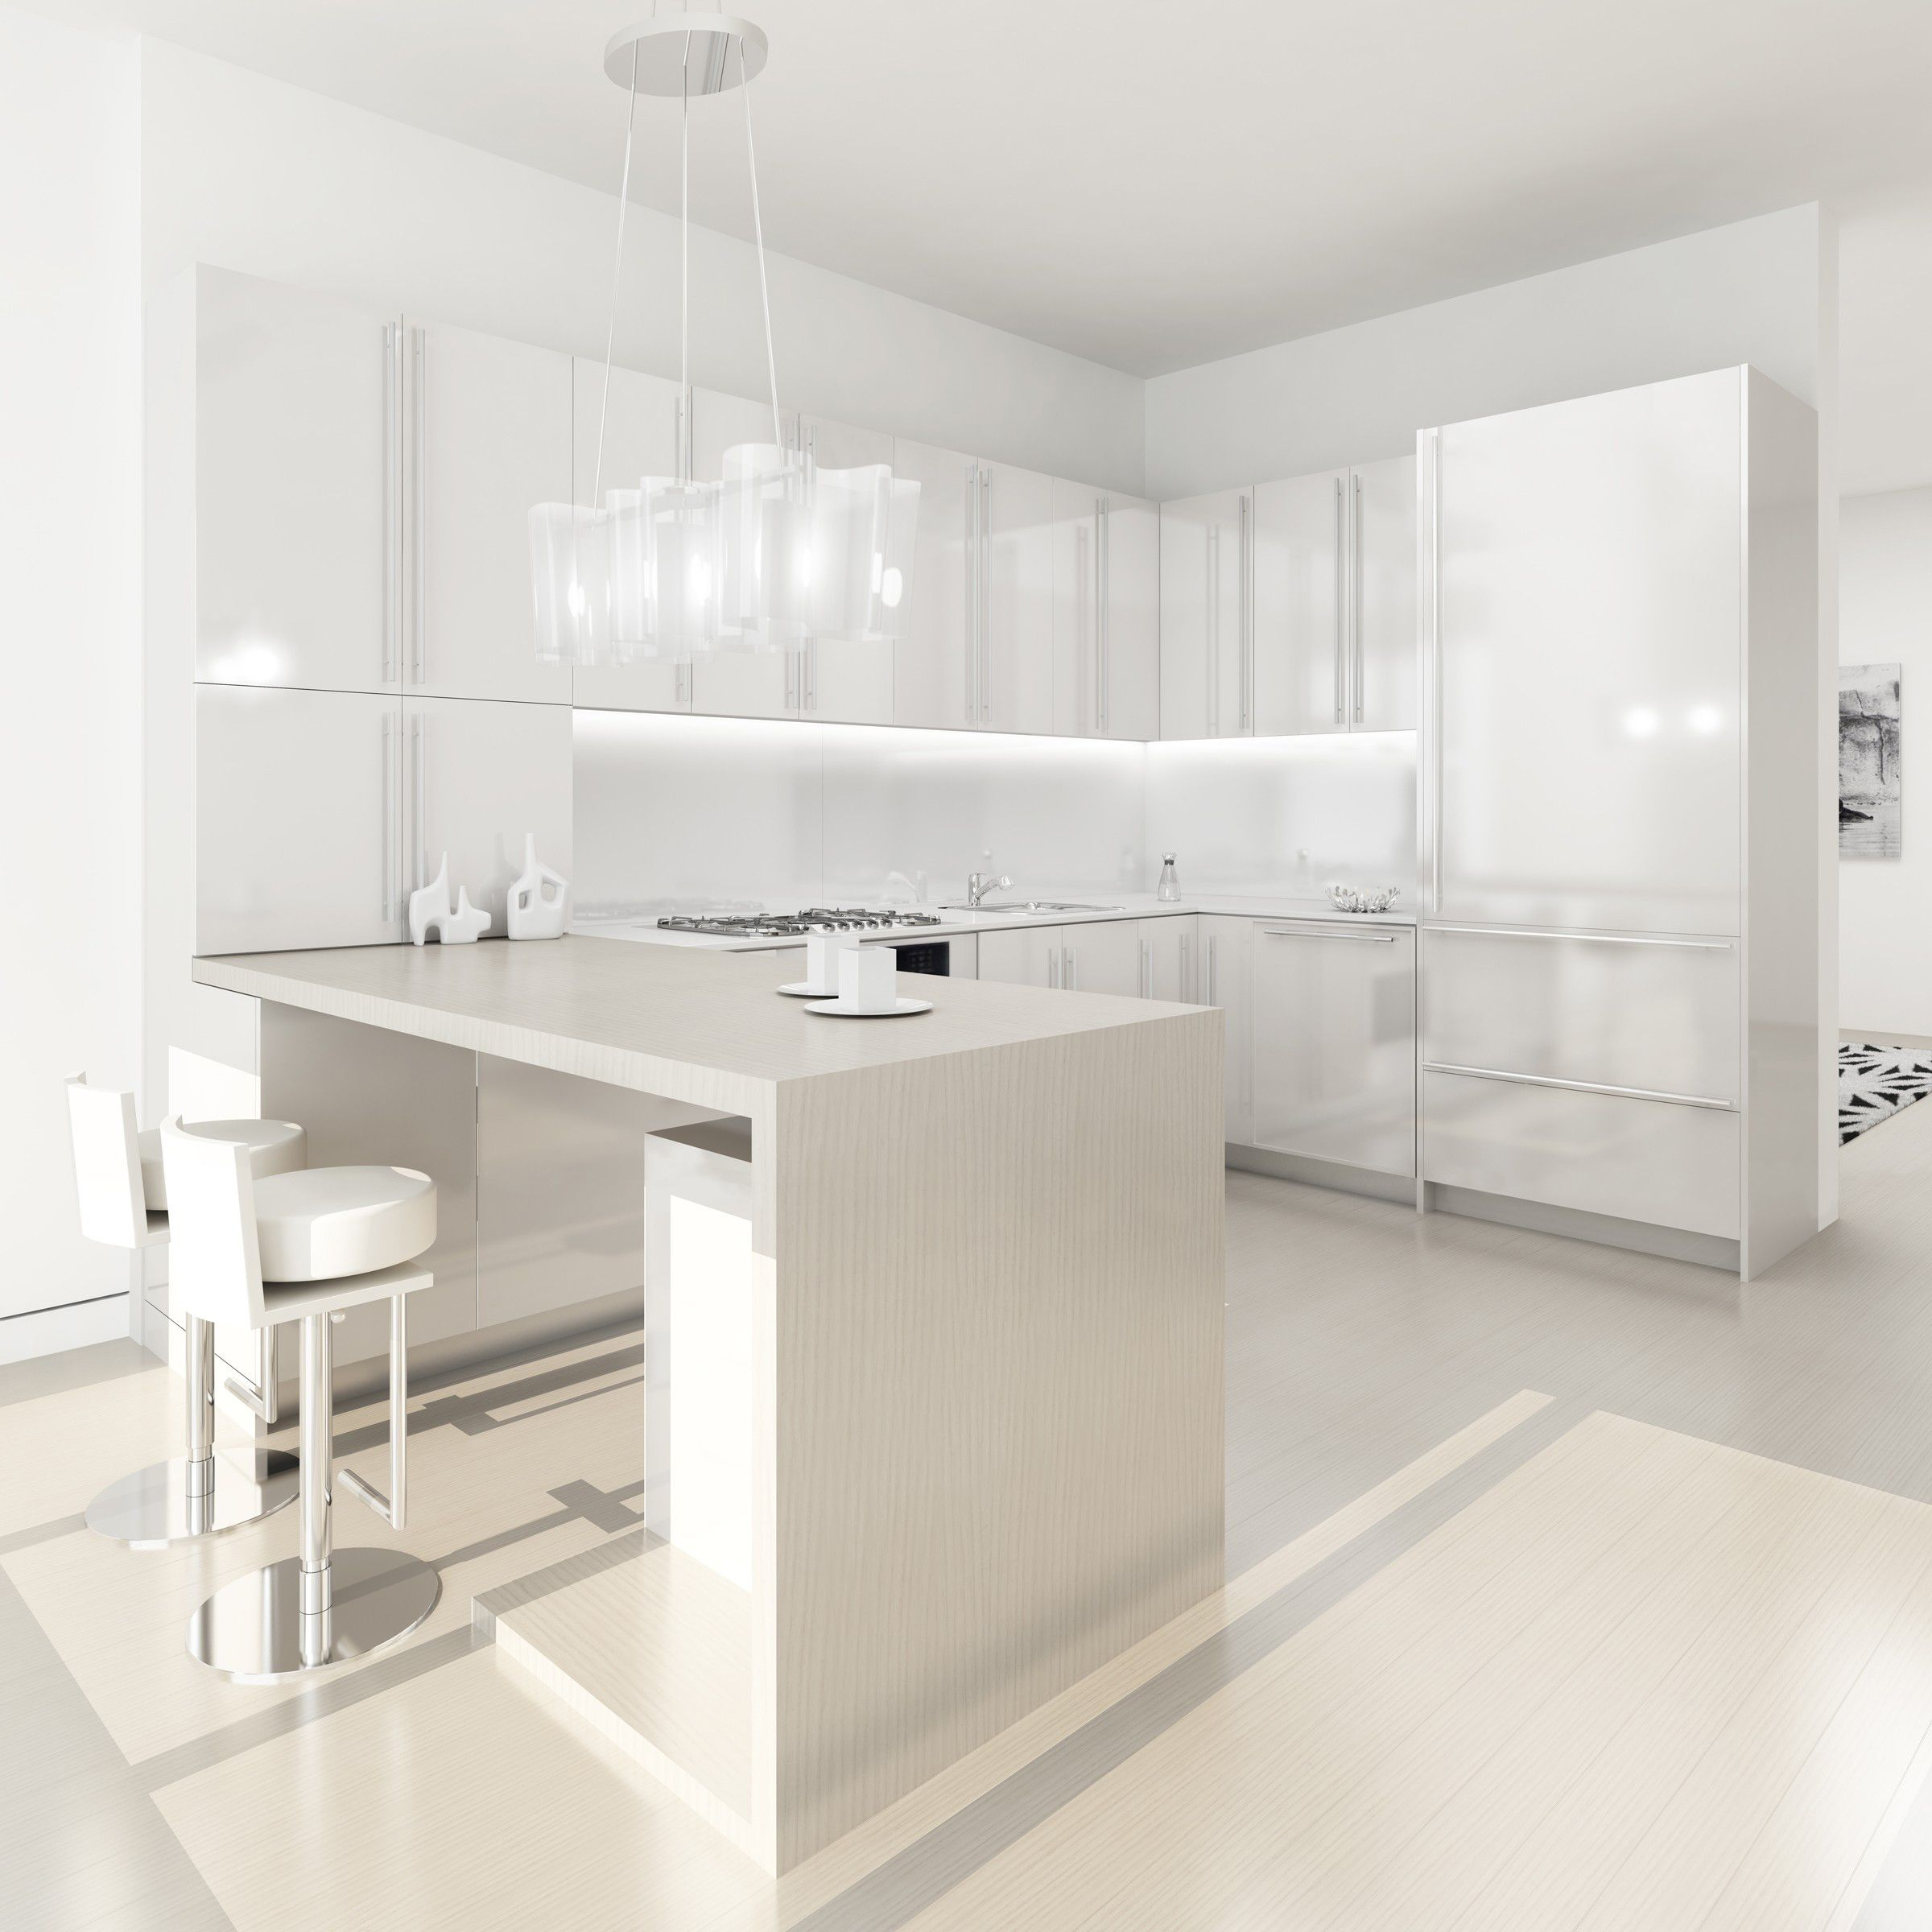 new home kitchen design ideas kitchen backsplash subway tile design ...